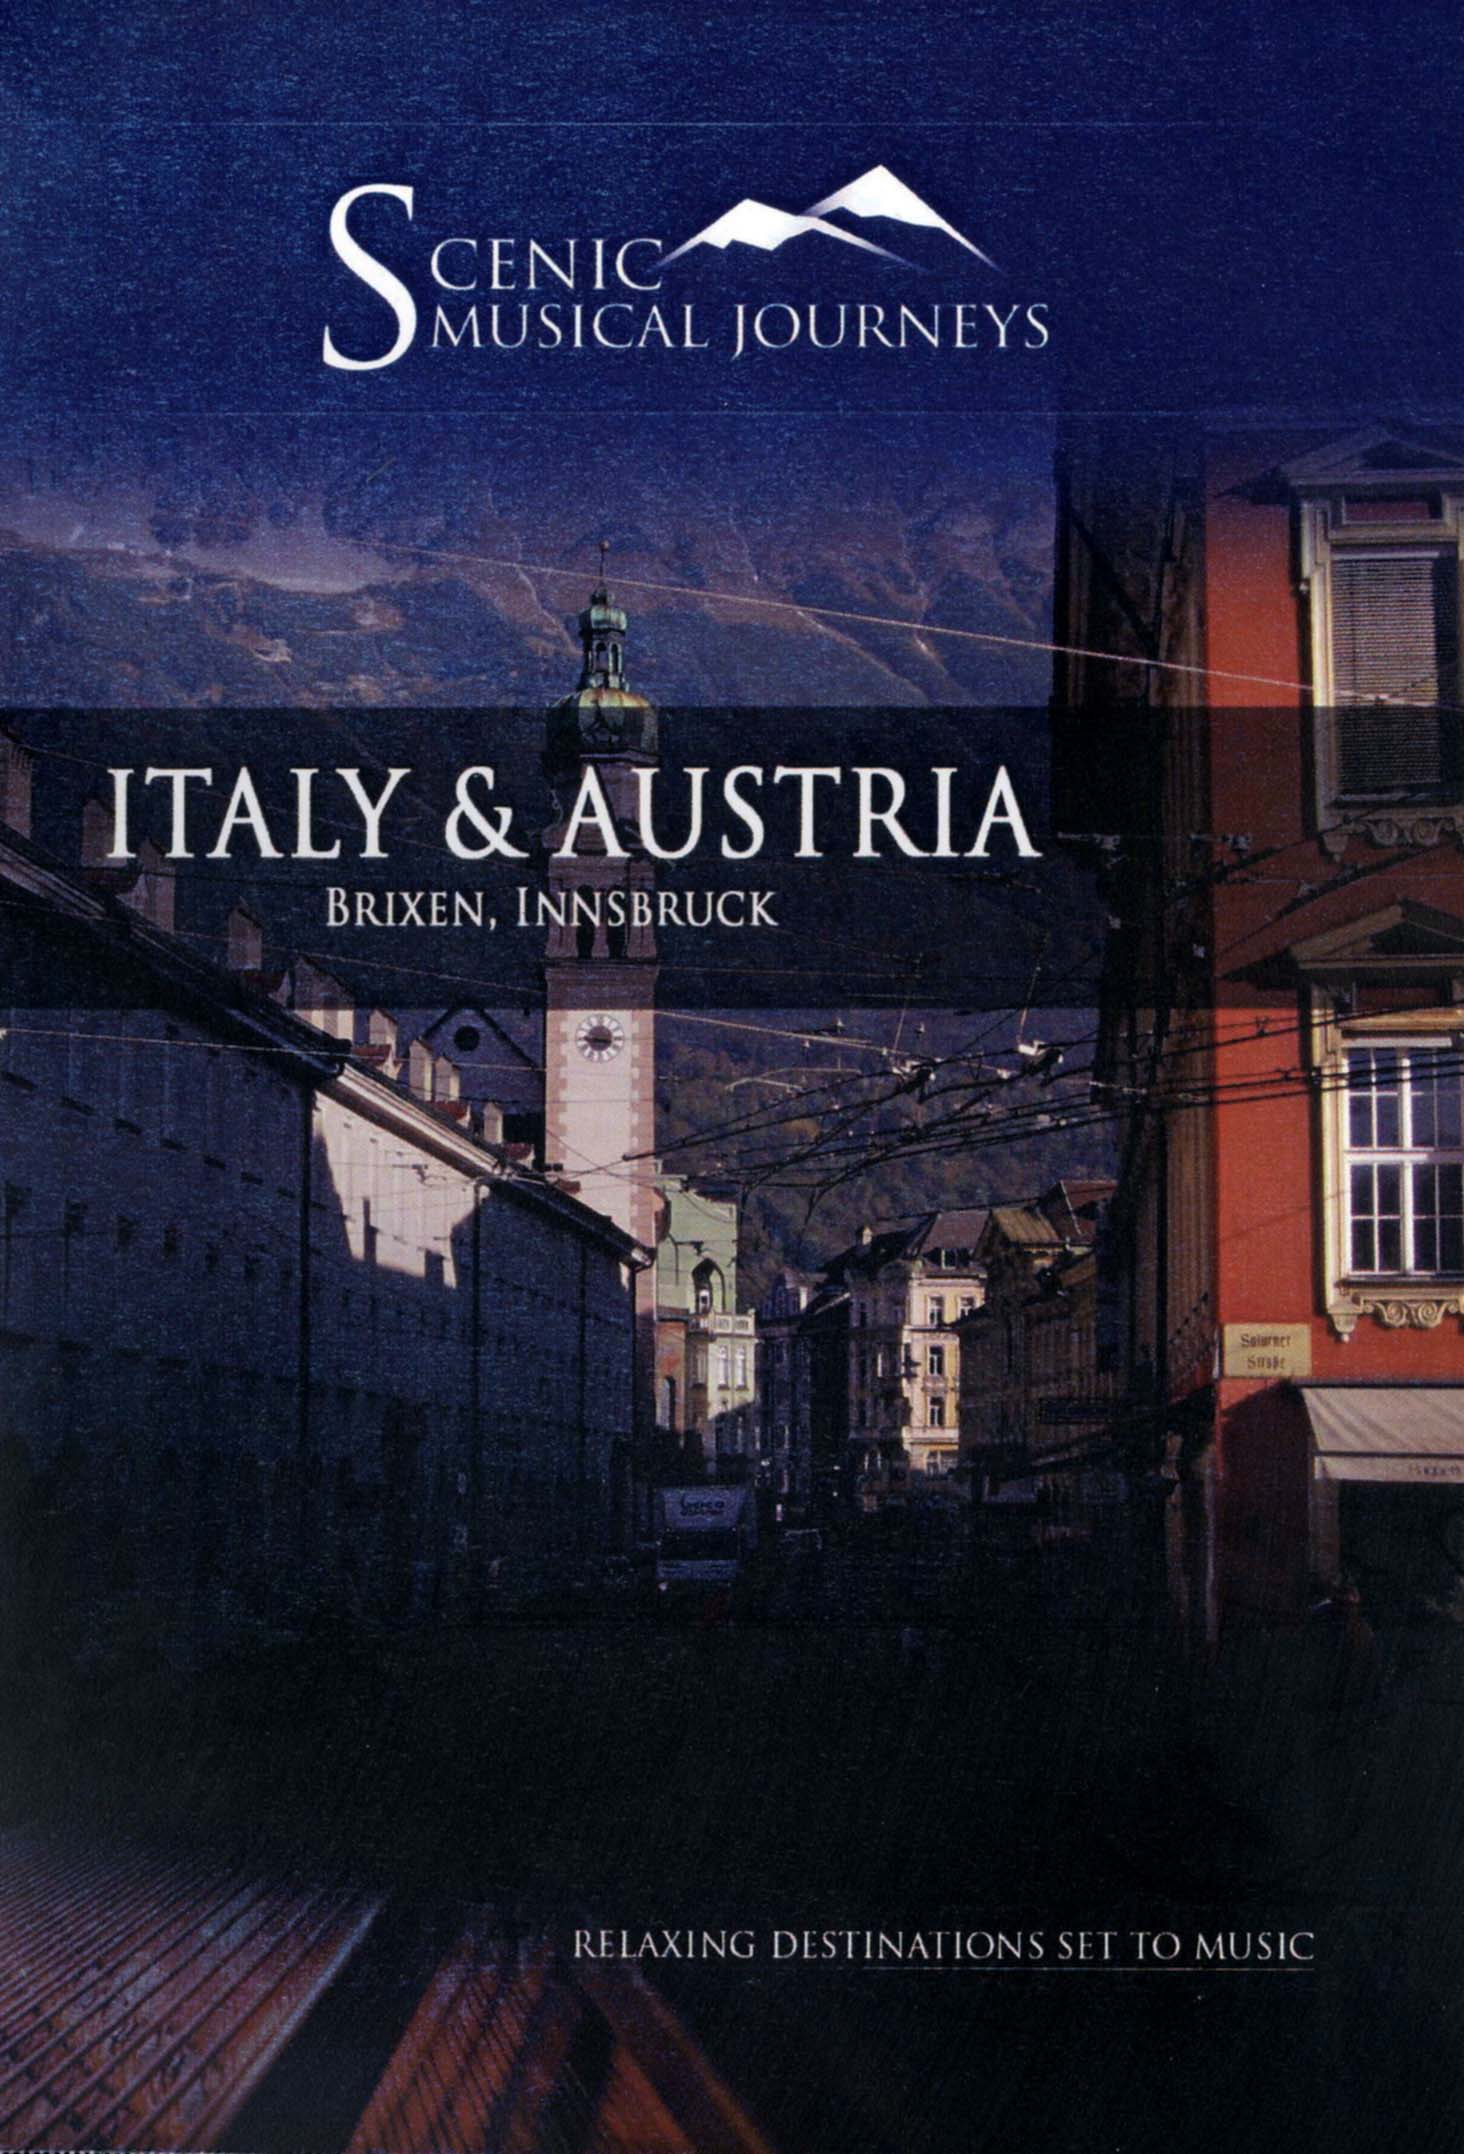 Scenic Musical Journeys: Italy & Austria - Brixen, Innsbruck